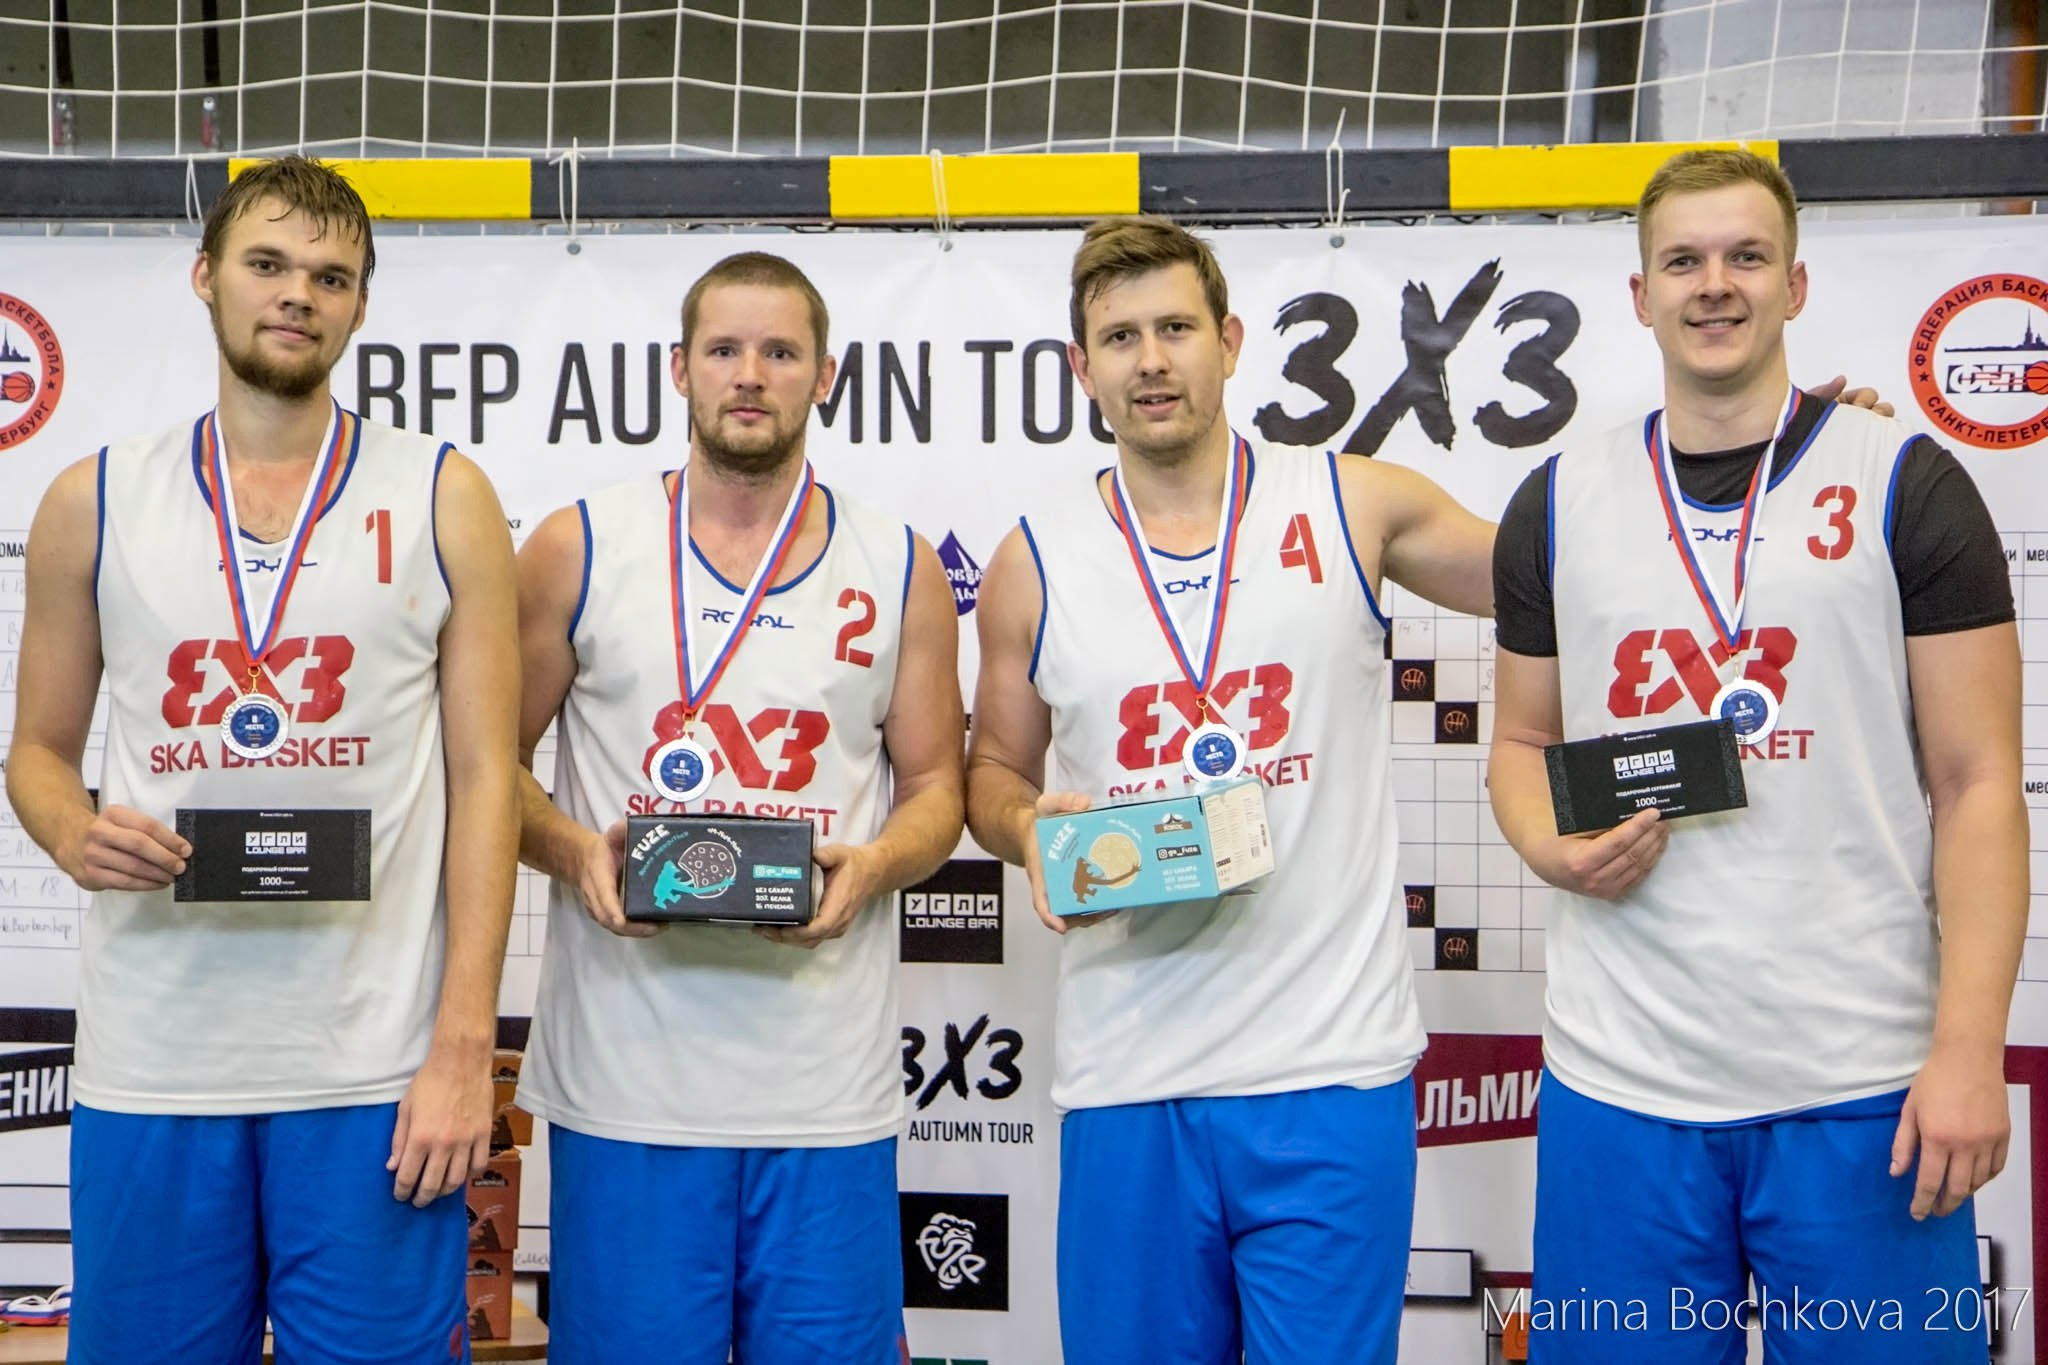 SKA Basket - серебряный призёр Дивизиона «Ленинград» BFP Autumn Tour 3x3